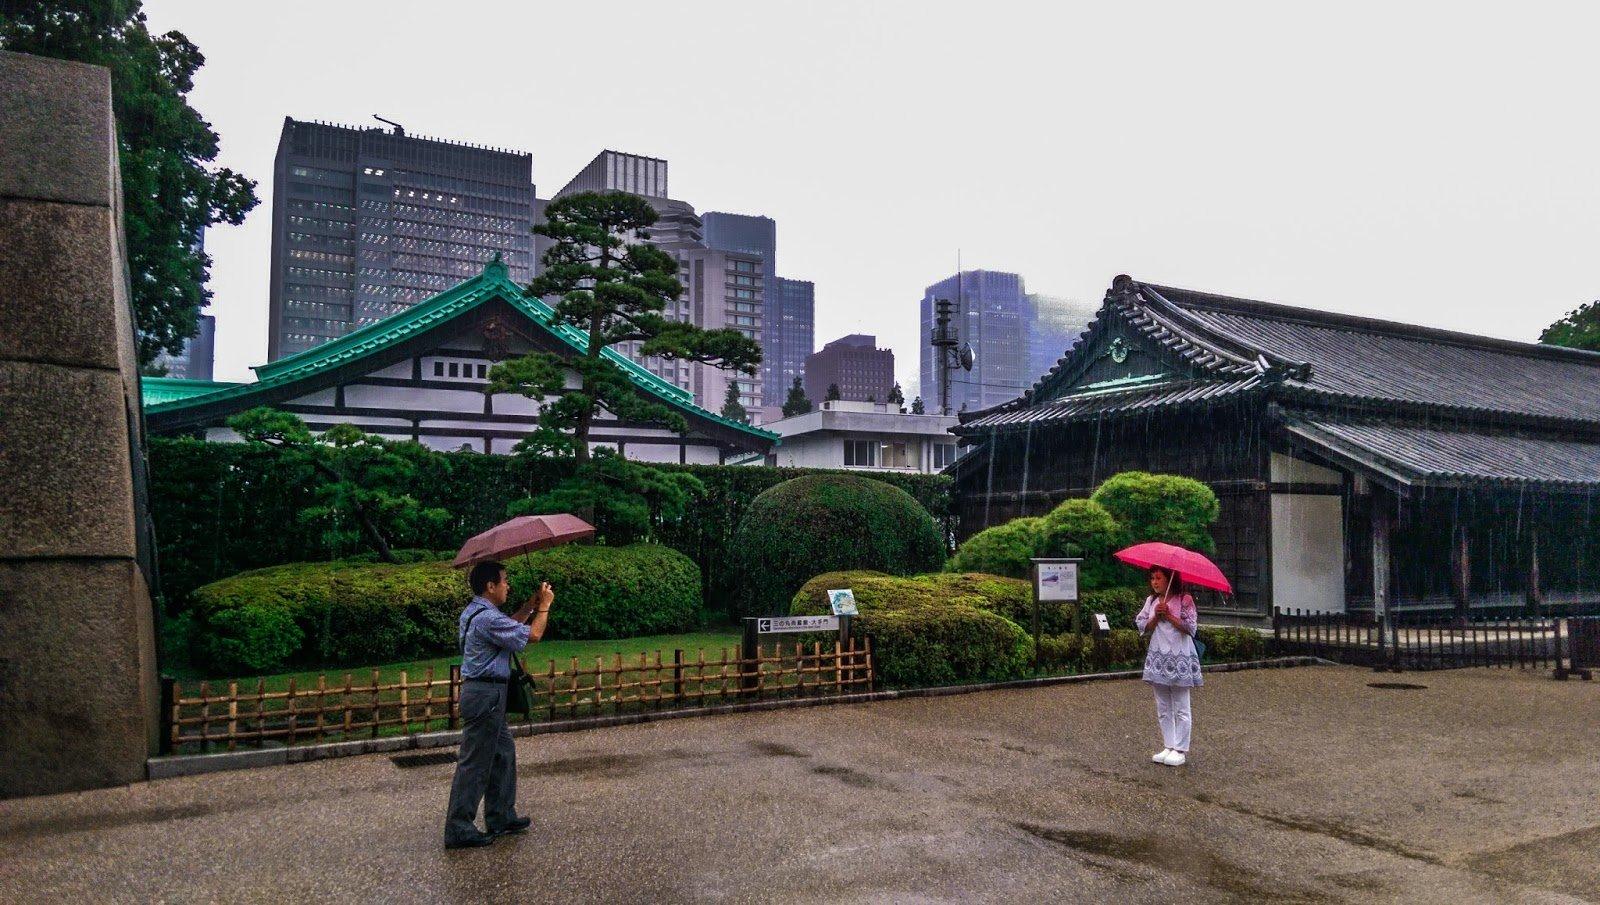 В основном районе Токио— Тиёда поошибке объявили угрозу теракта